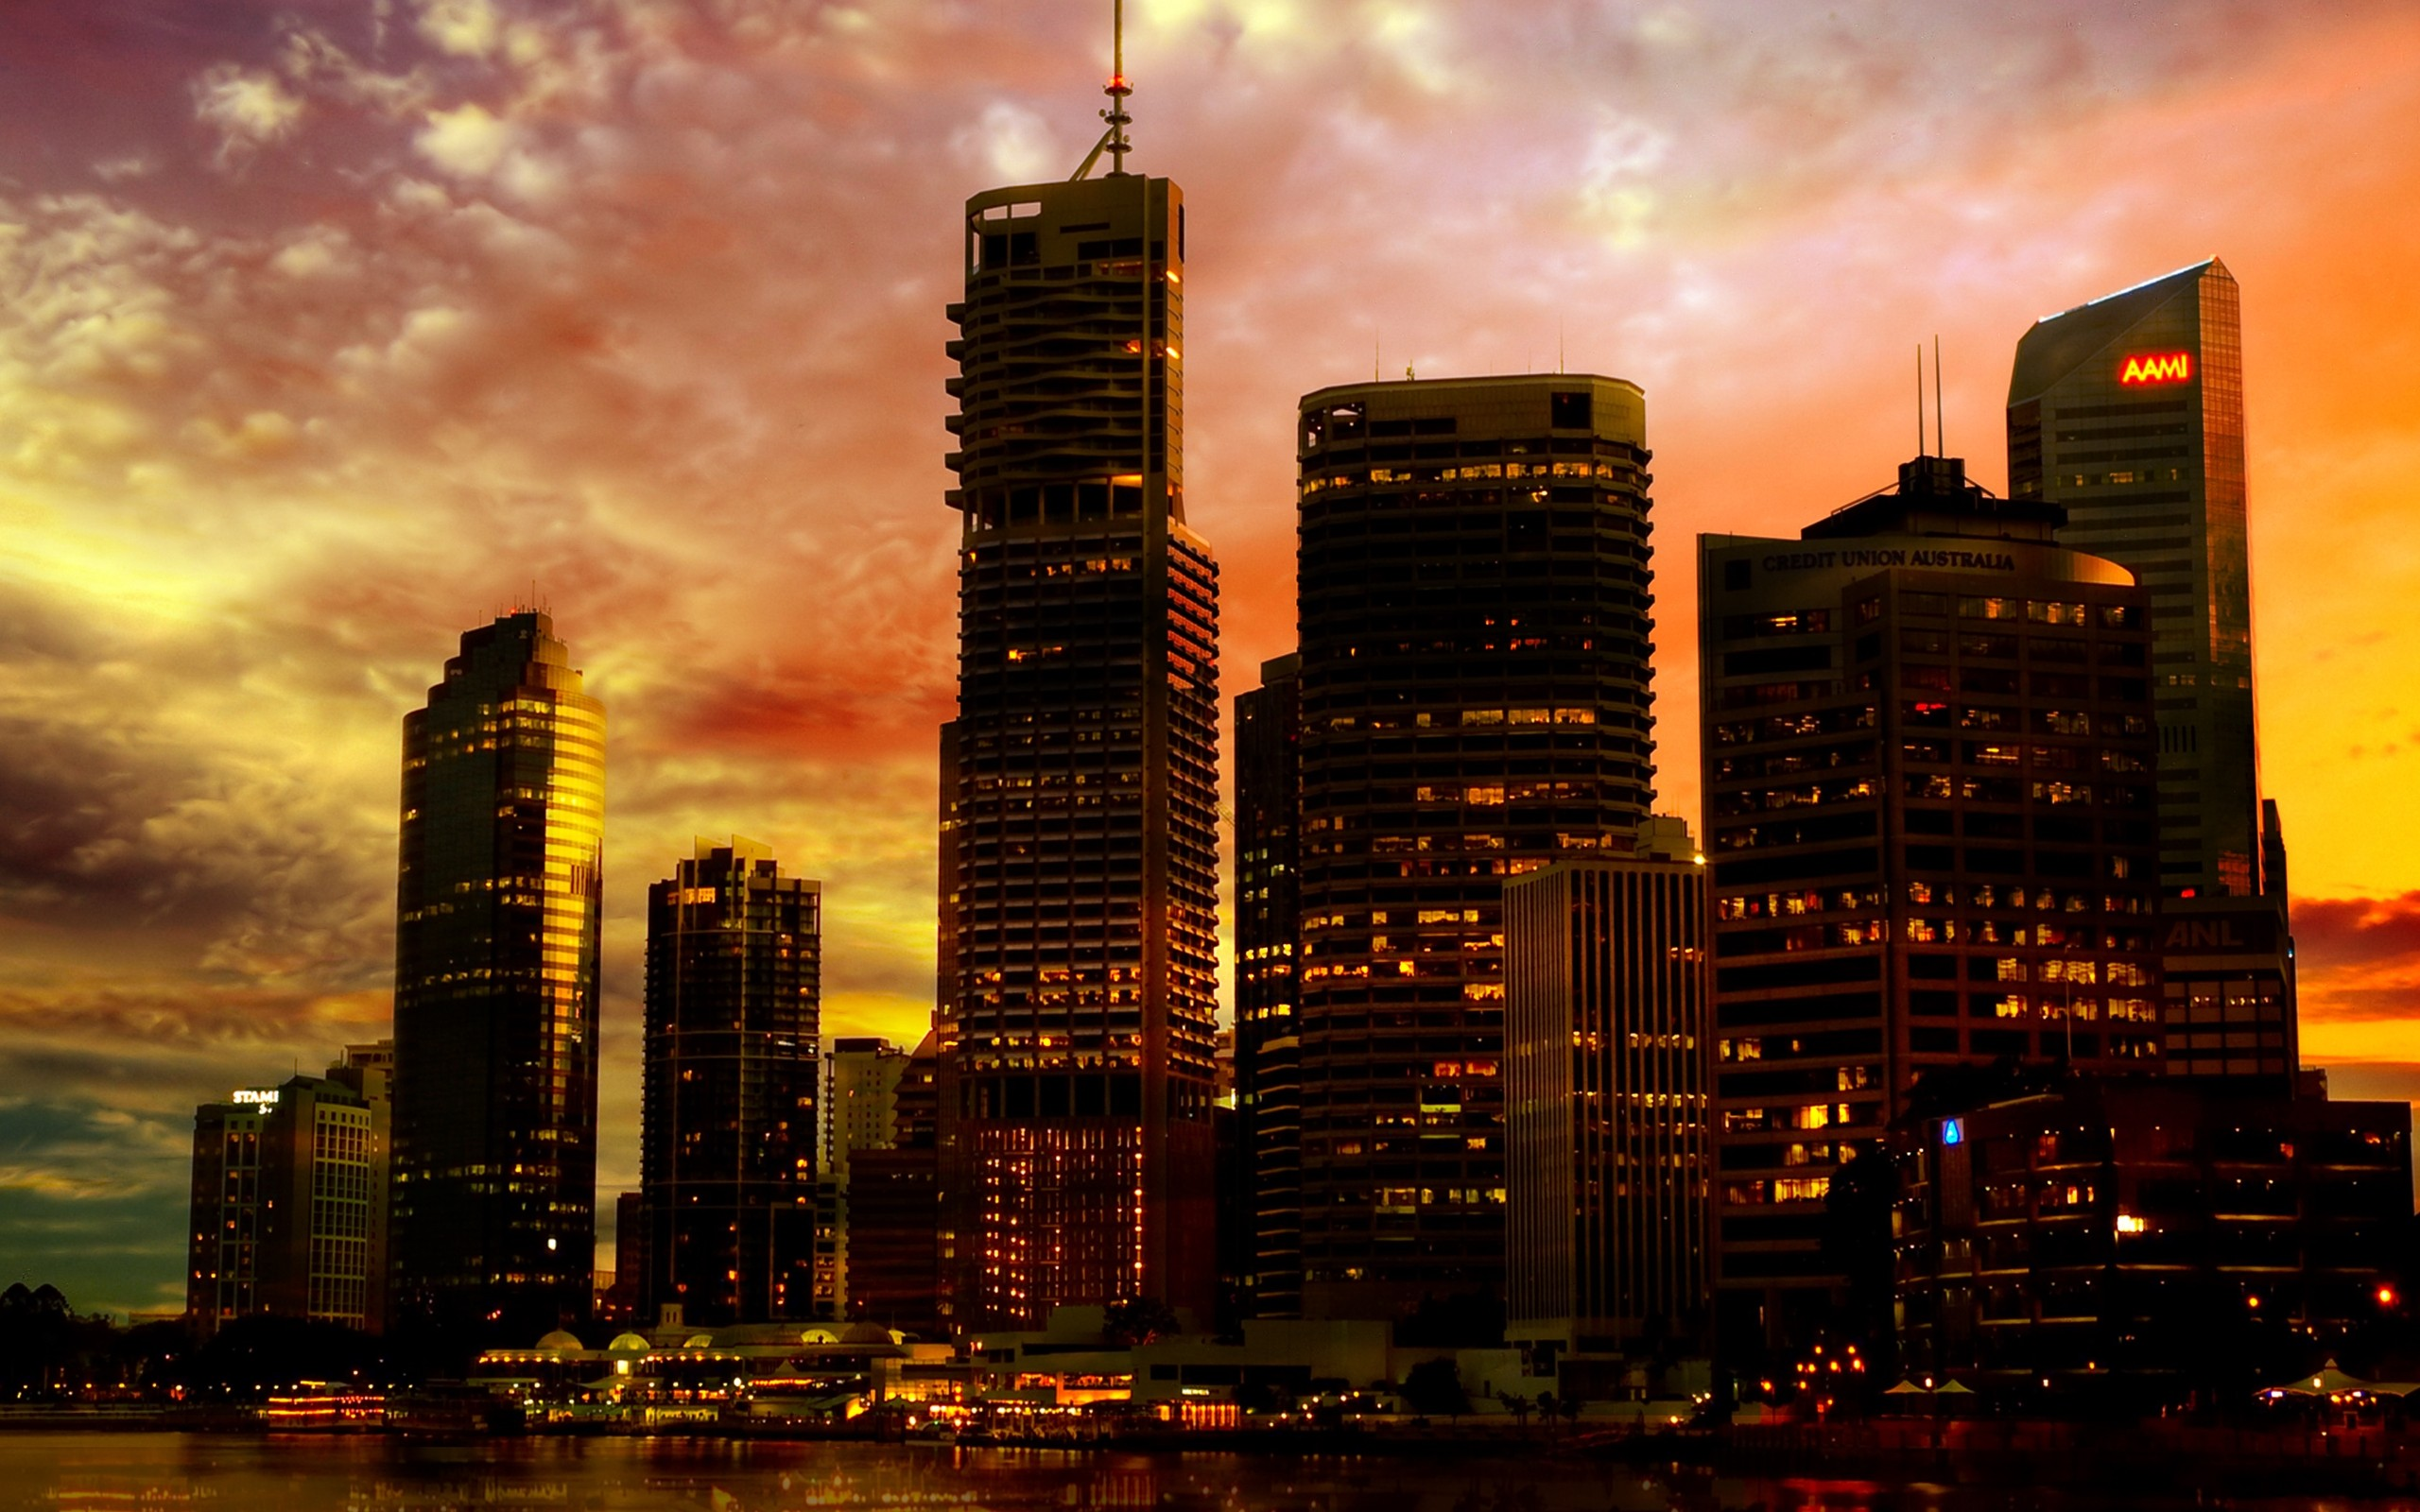 Brisbane australia wallpaper   Design Art Wallpaper 2560x1600